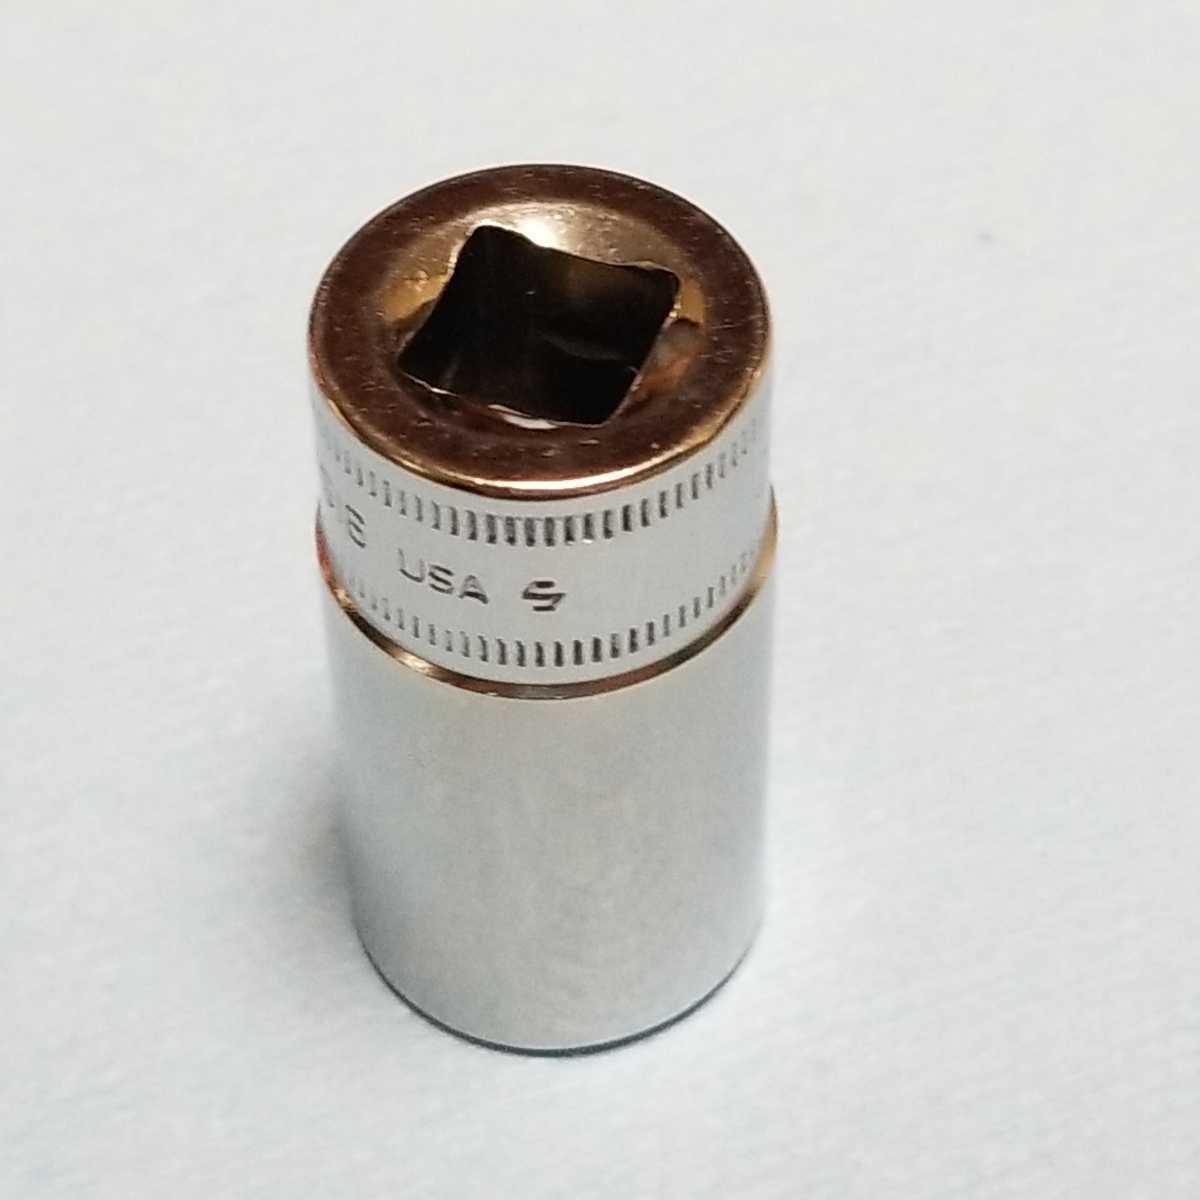 16mm 3/8 セミディープ スナップオン FSMS16 (6角) 中古品 美品 保管品 SNAPON SNAP-ON セミディープソケット ソケット 送料無料 _画像2